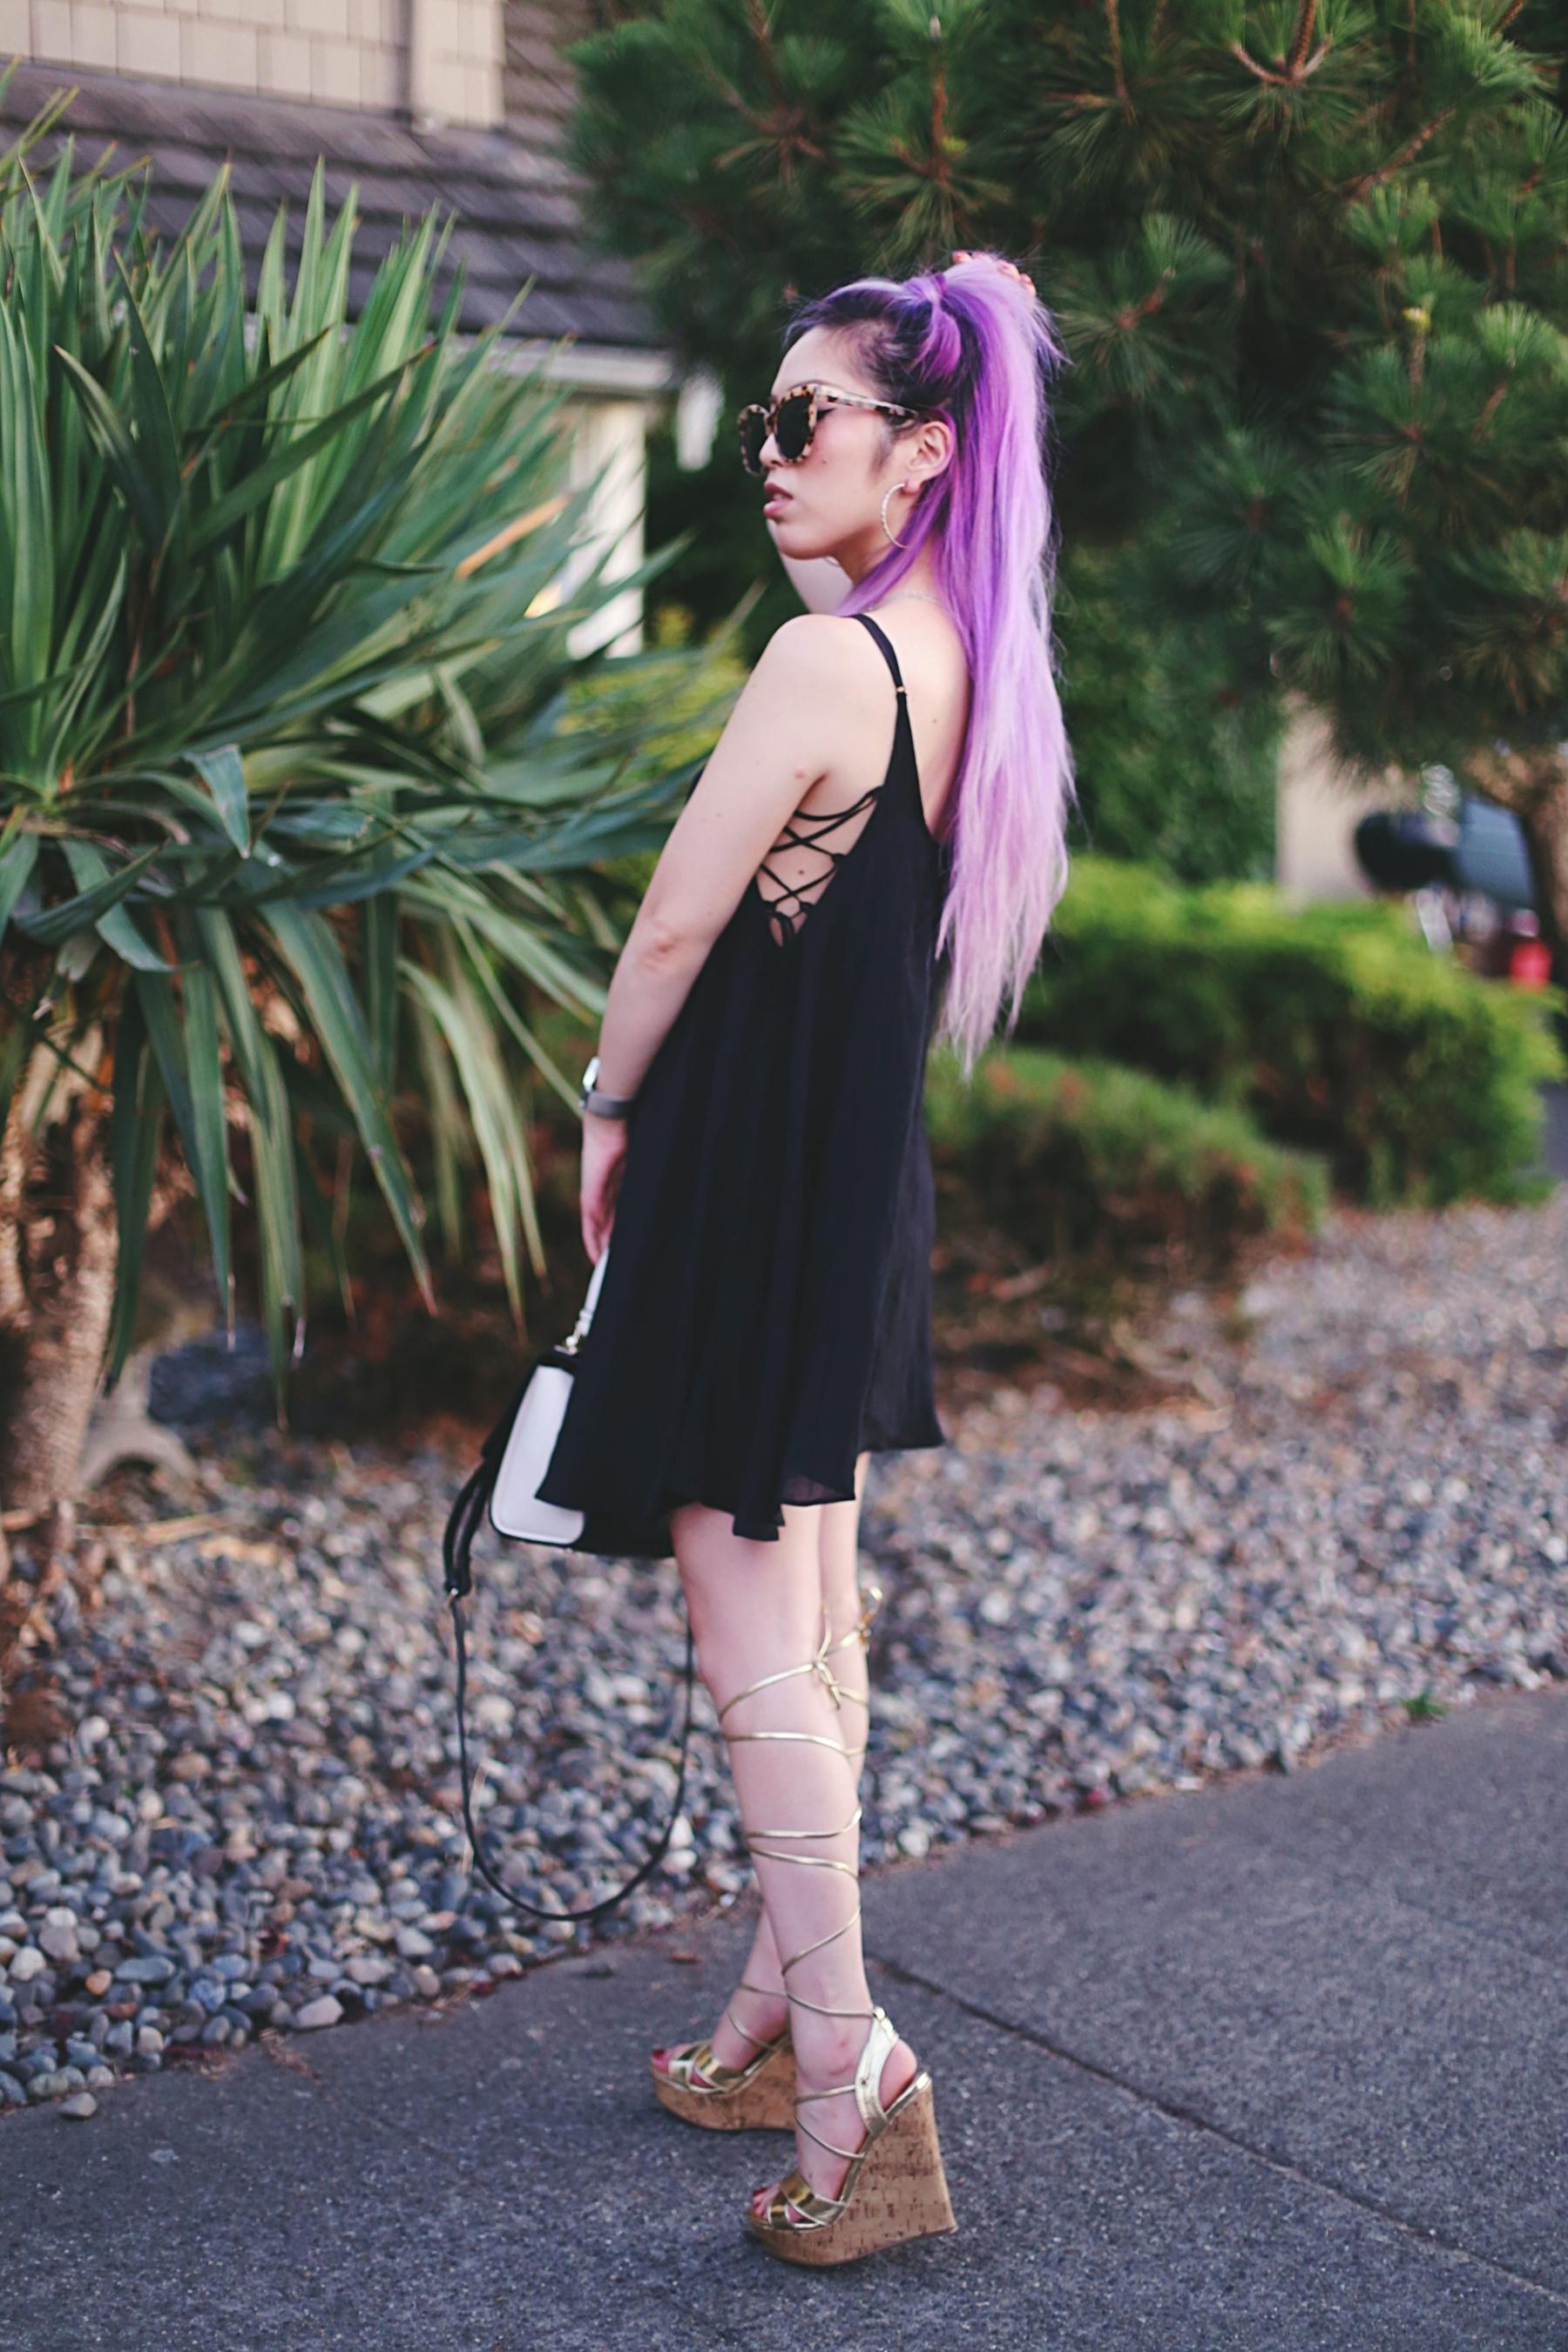 Urban Outfitters Kimchi Blue Lace-Up Side Mini Dress & Carmen Oversized Cat-Eye Sunglasses_ShoeDazzle Gold lace up wedge sandals_ZARA CONTRAST MINI CITY BAG_Christian Paul 43MM HAYMAN MARBLE MESH watch_Aikas Love Closet_Seattle Fashion Blogger from Japan_Lavender Hair_Purple hair